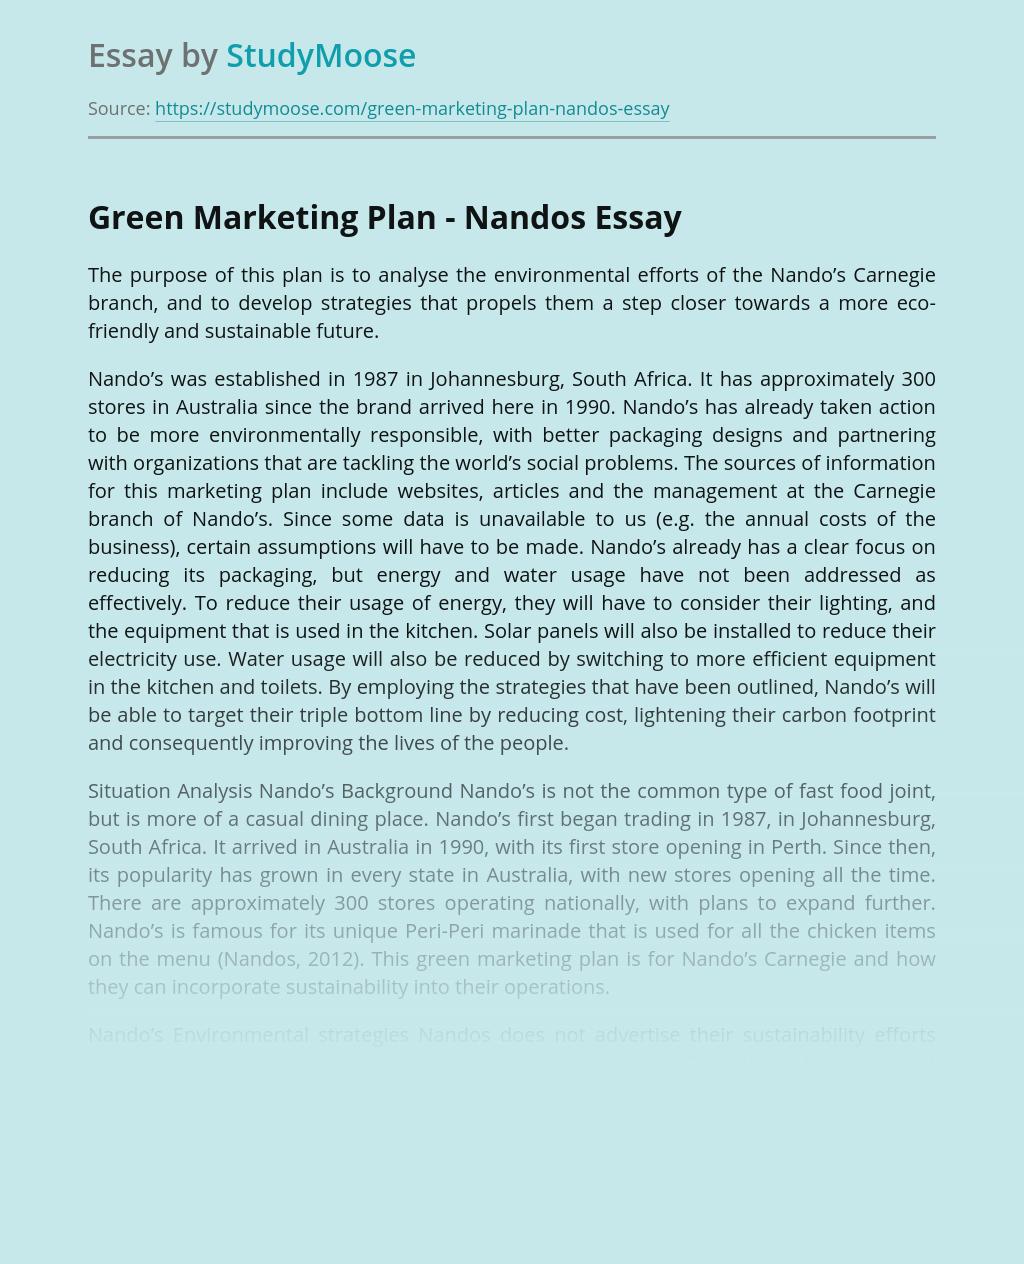 Green Marketing Plan - Nandos